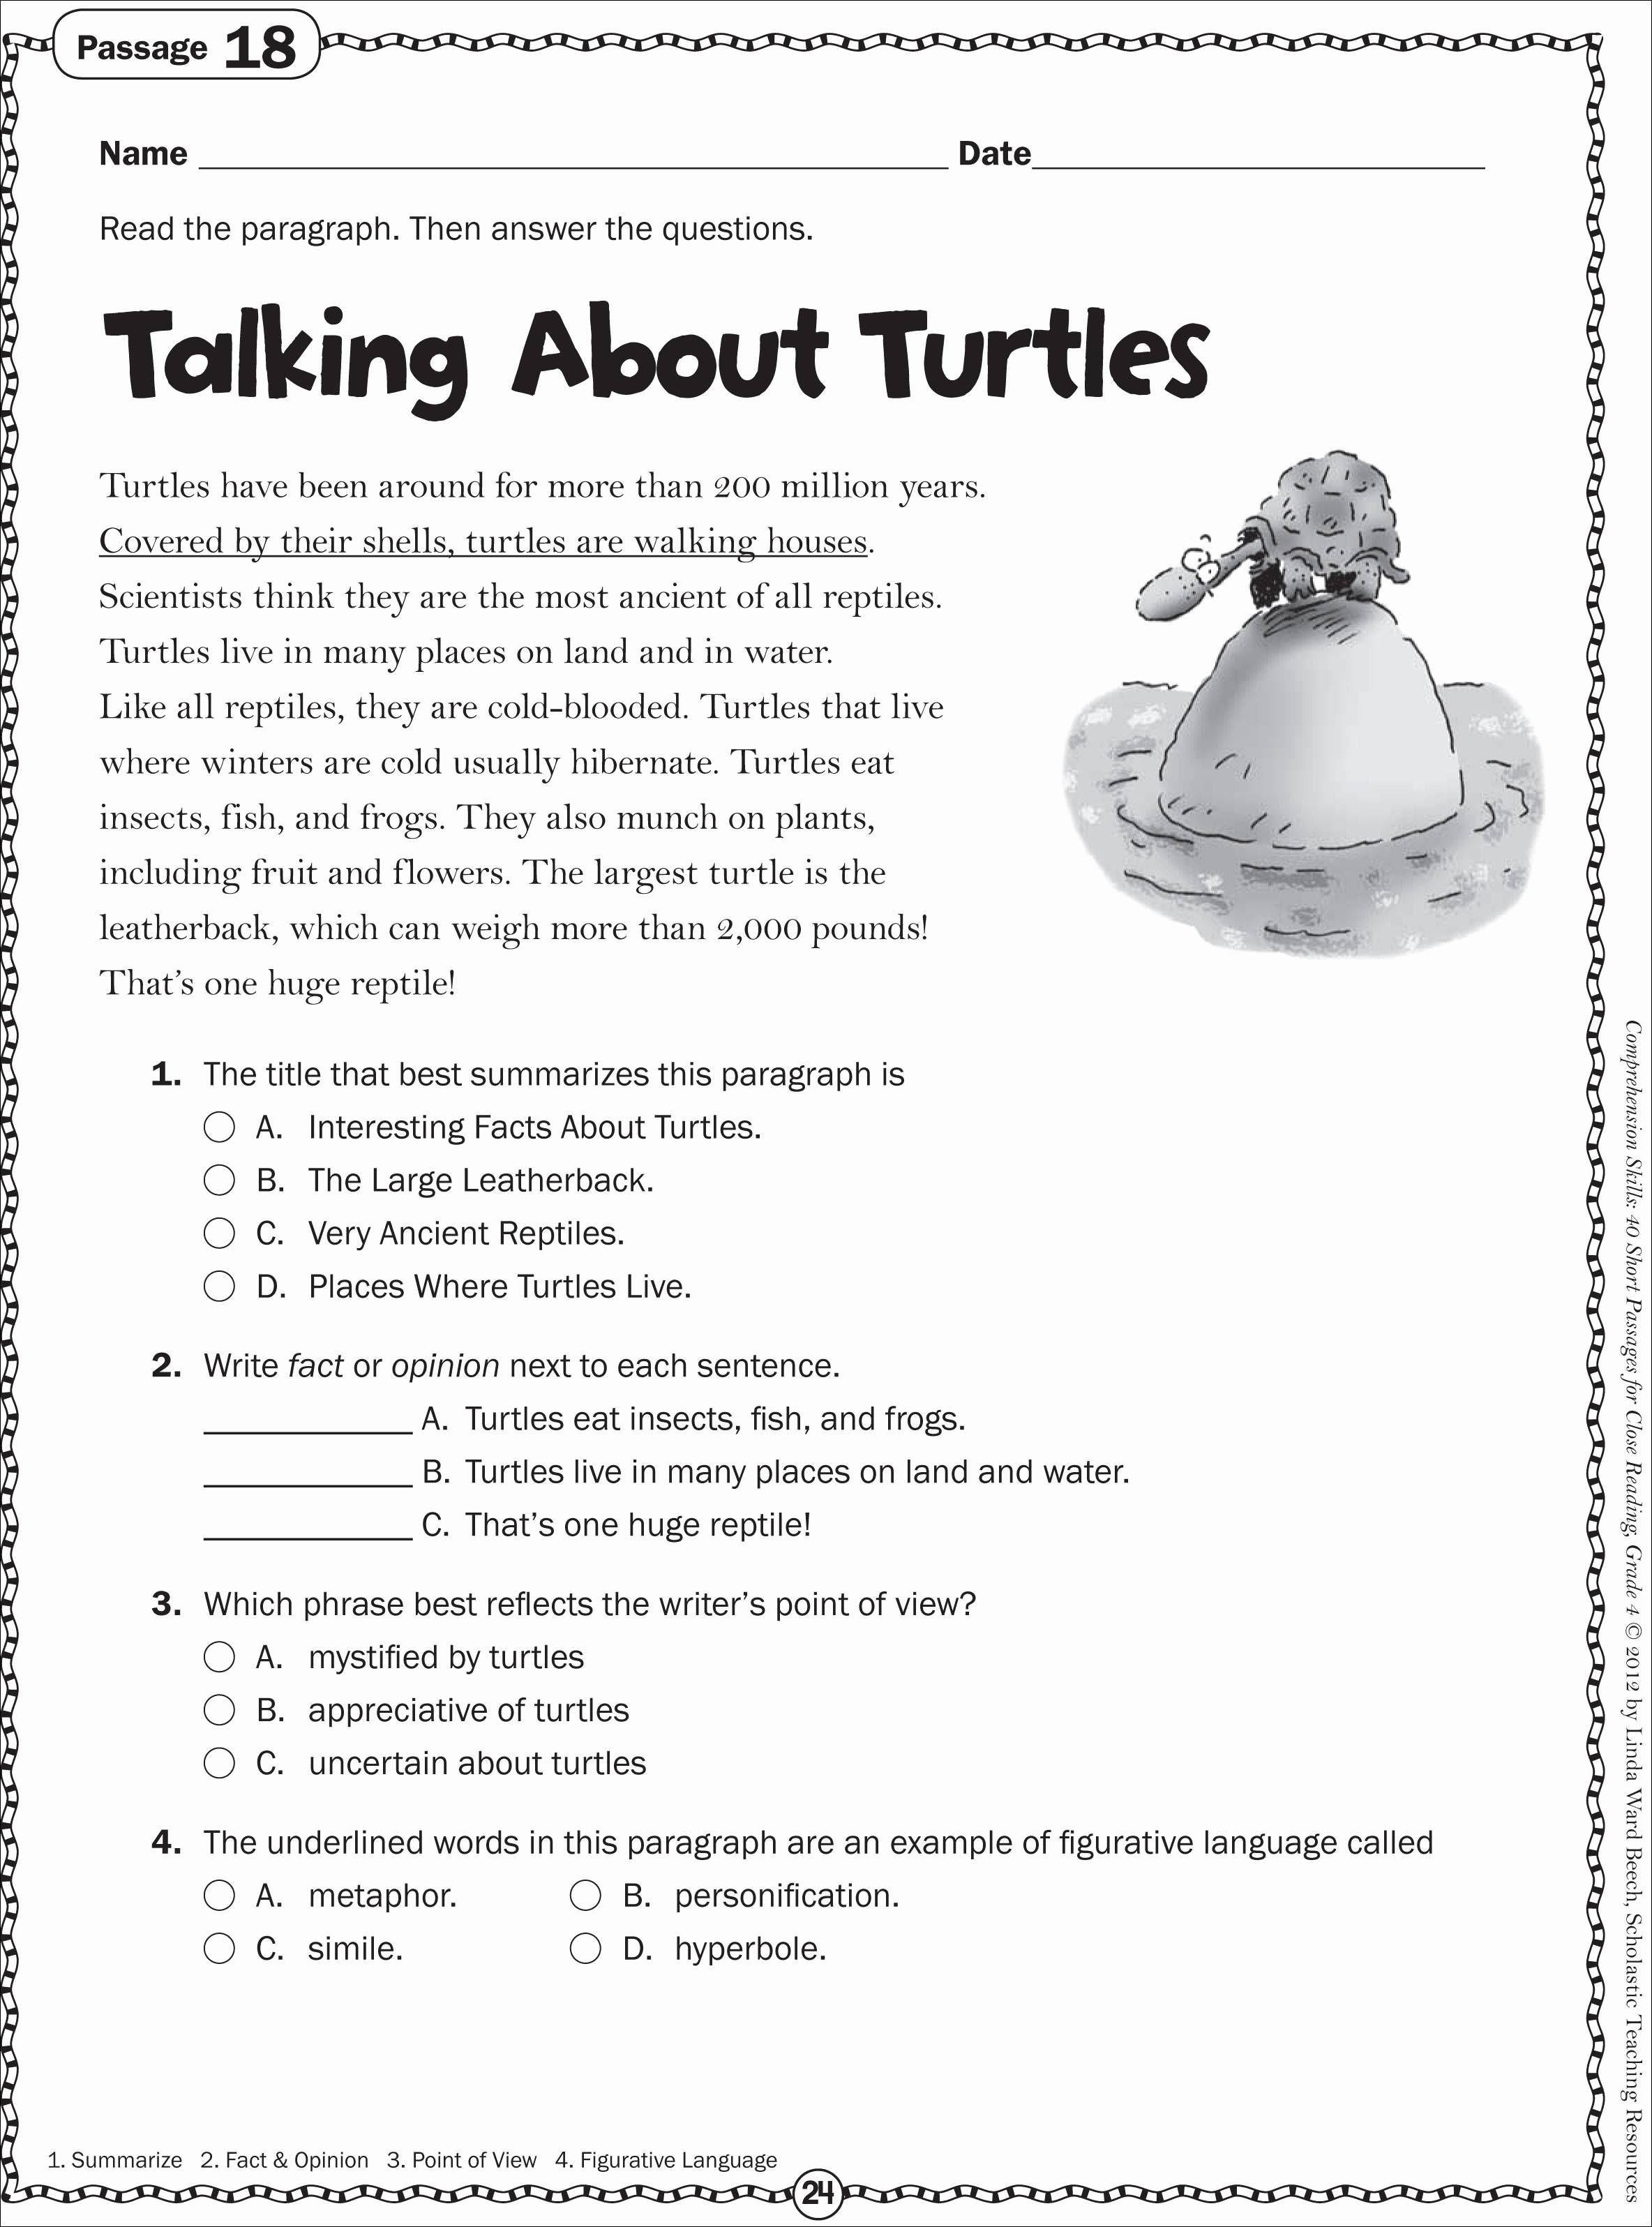 Inspirational Science Worksheets For 3rd Grade Como Ensenar A Leer Ensenar A Leer Ejercicios De Ingles Fact or opinion worksheets